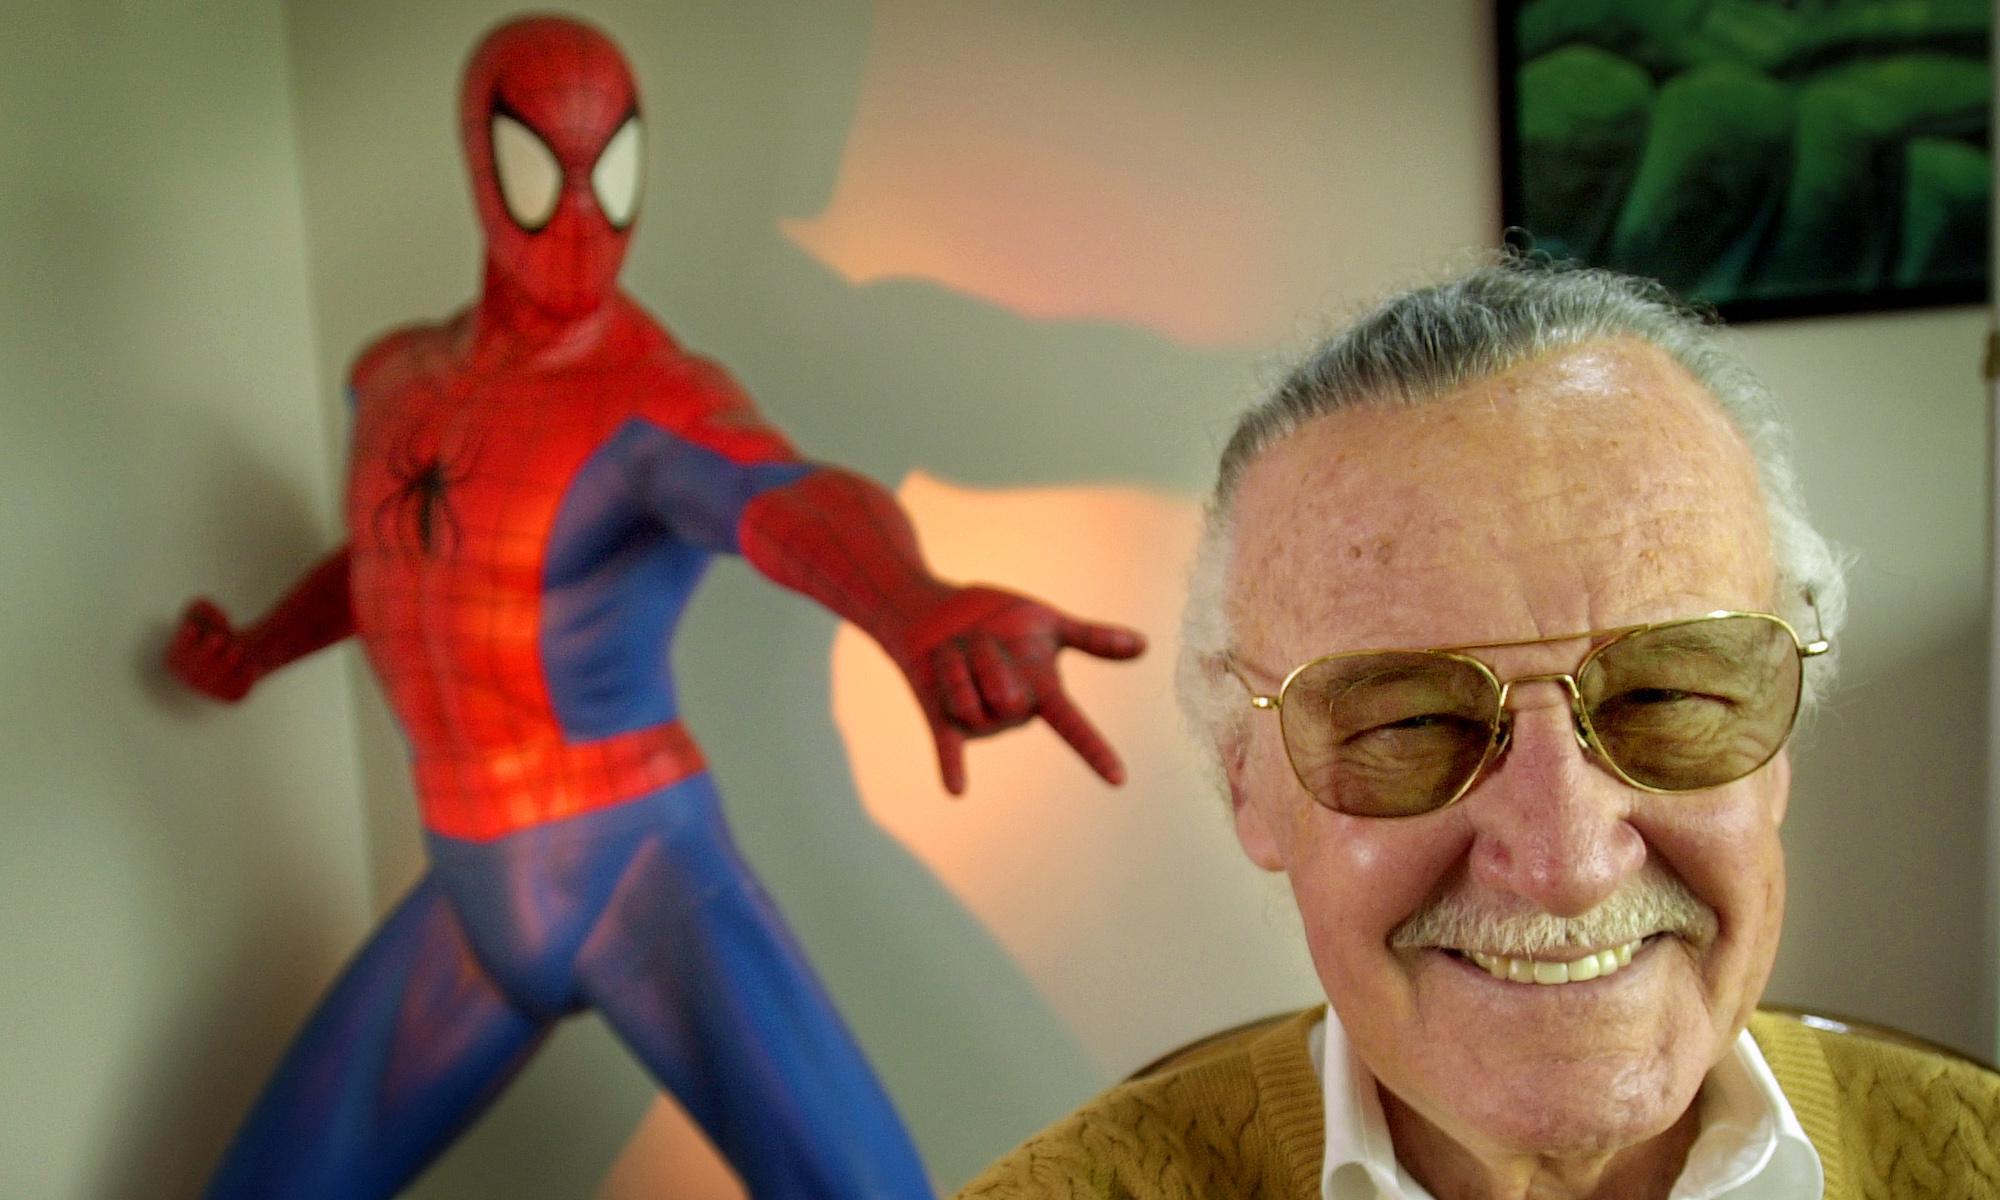 Stan Lee: Spider-Man, X-Men and Avengers creator dies aged 95